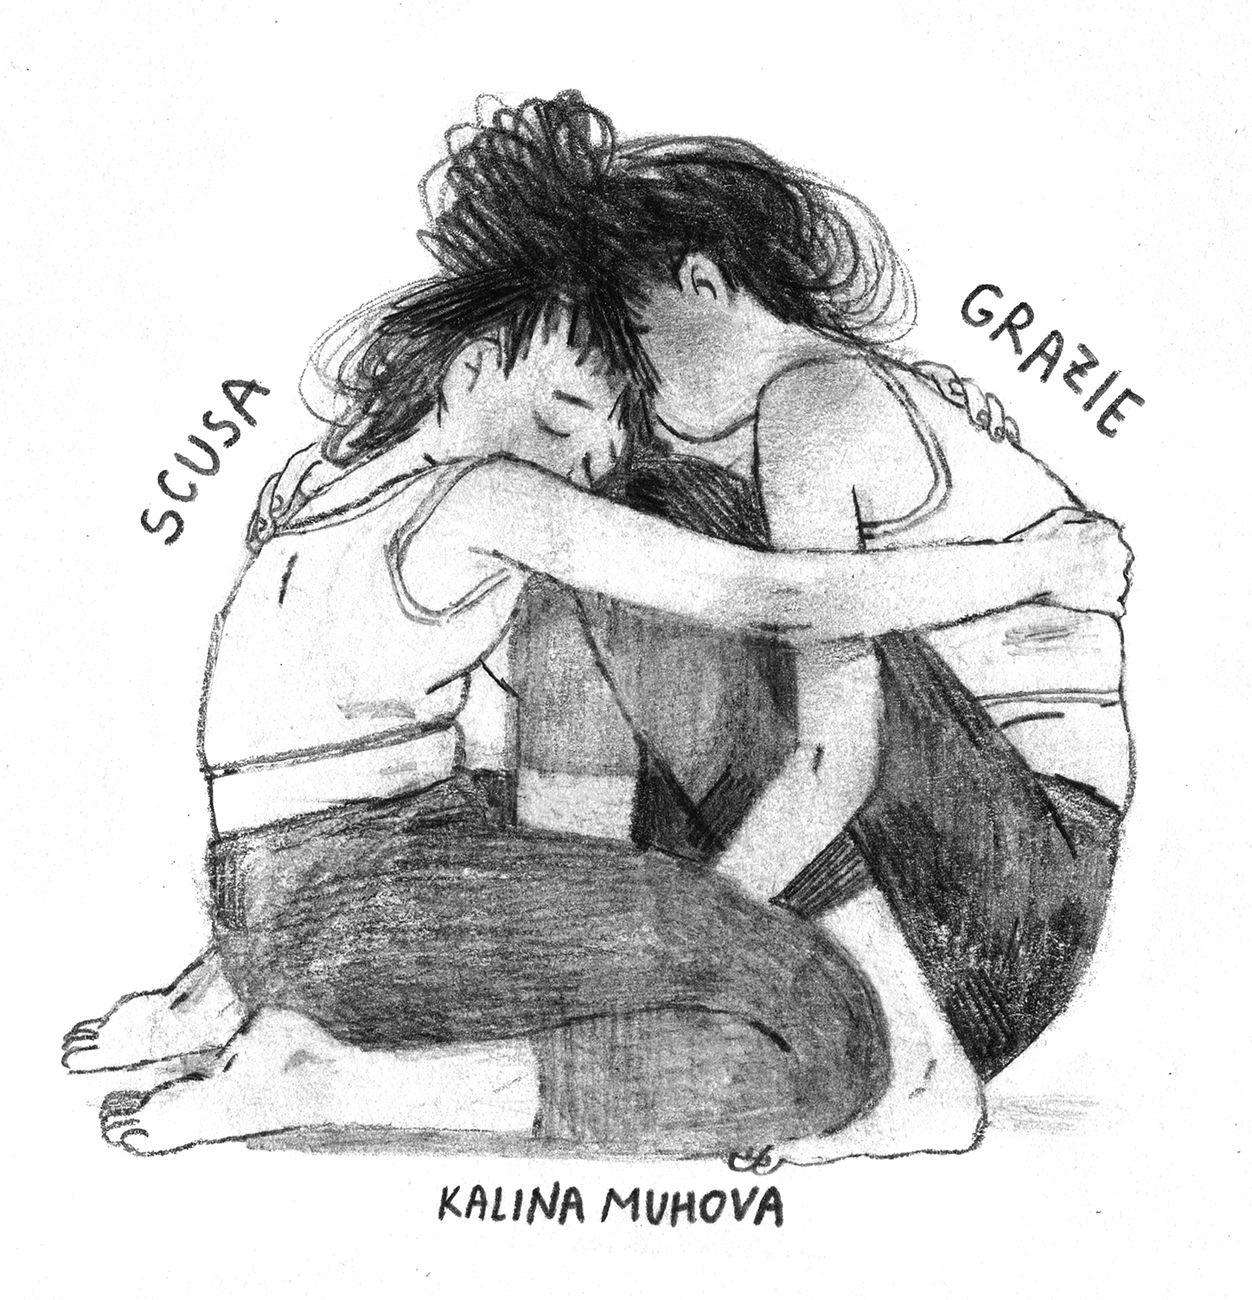 Kalina Muhova. GrazieScusa © Kalina Muhova